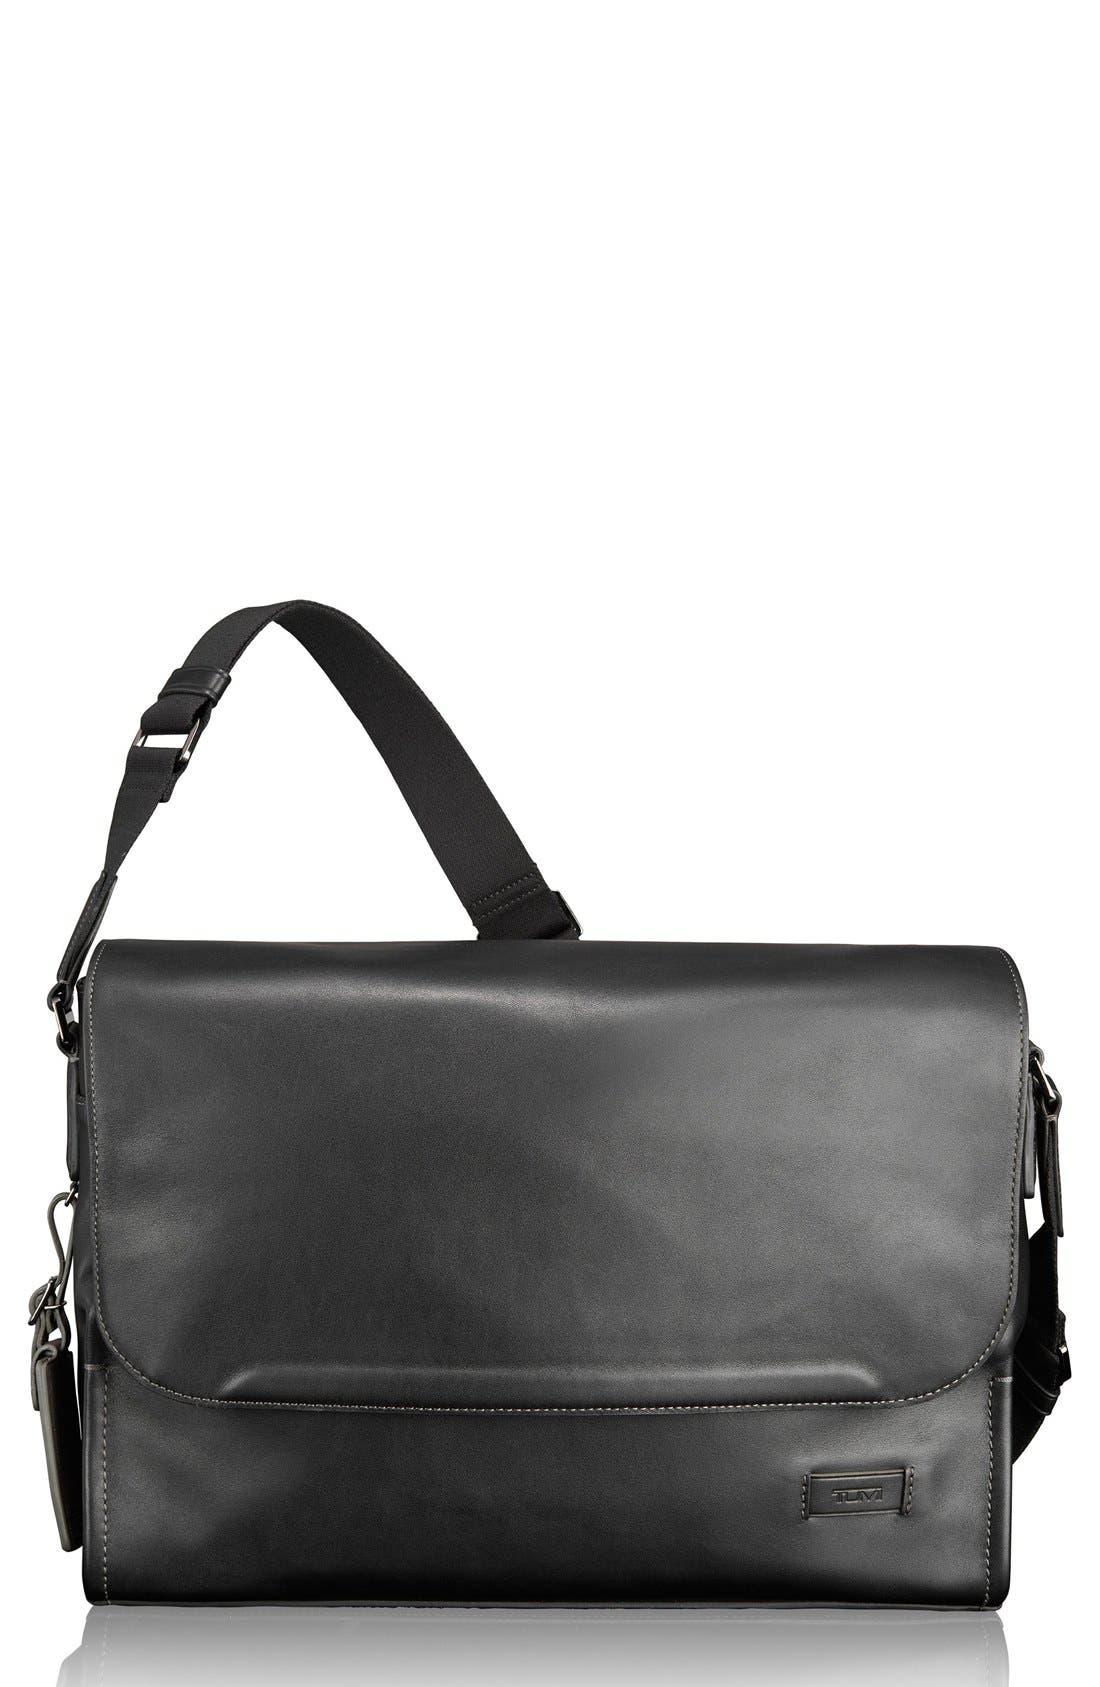 Alternate Image 1 Selected - Tumi 'Harrison - Mathews' Messenger Bag